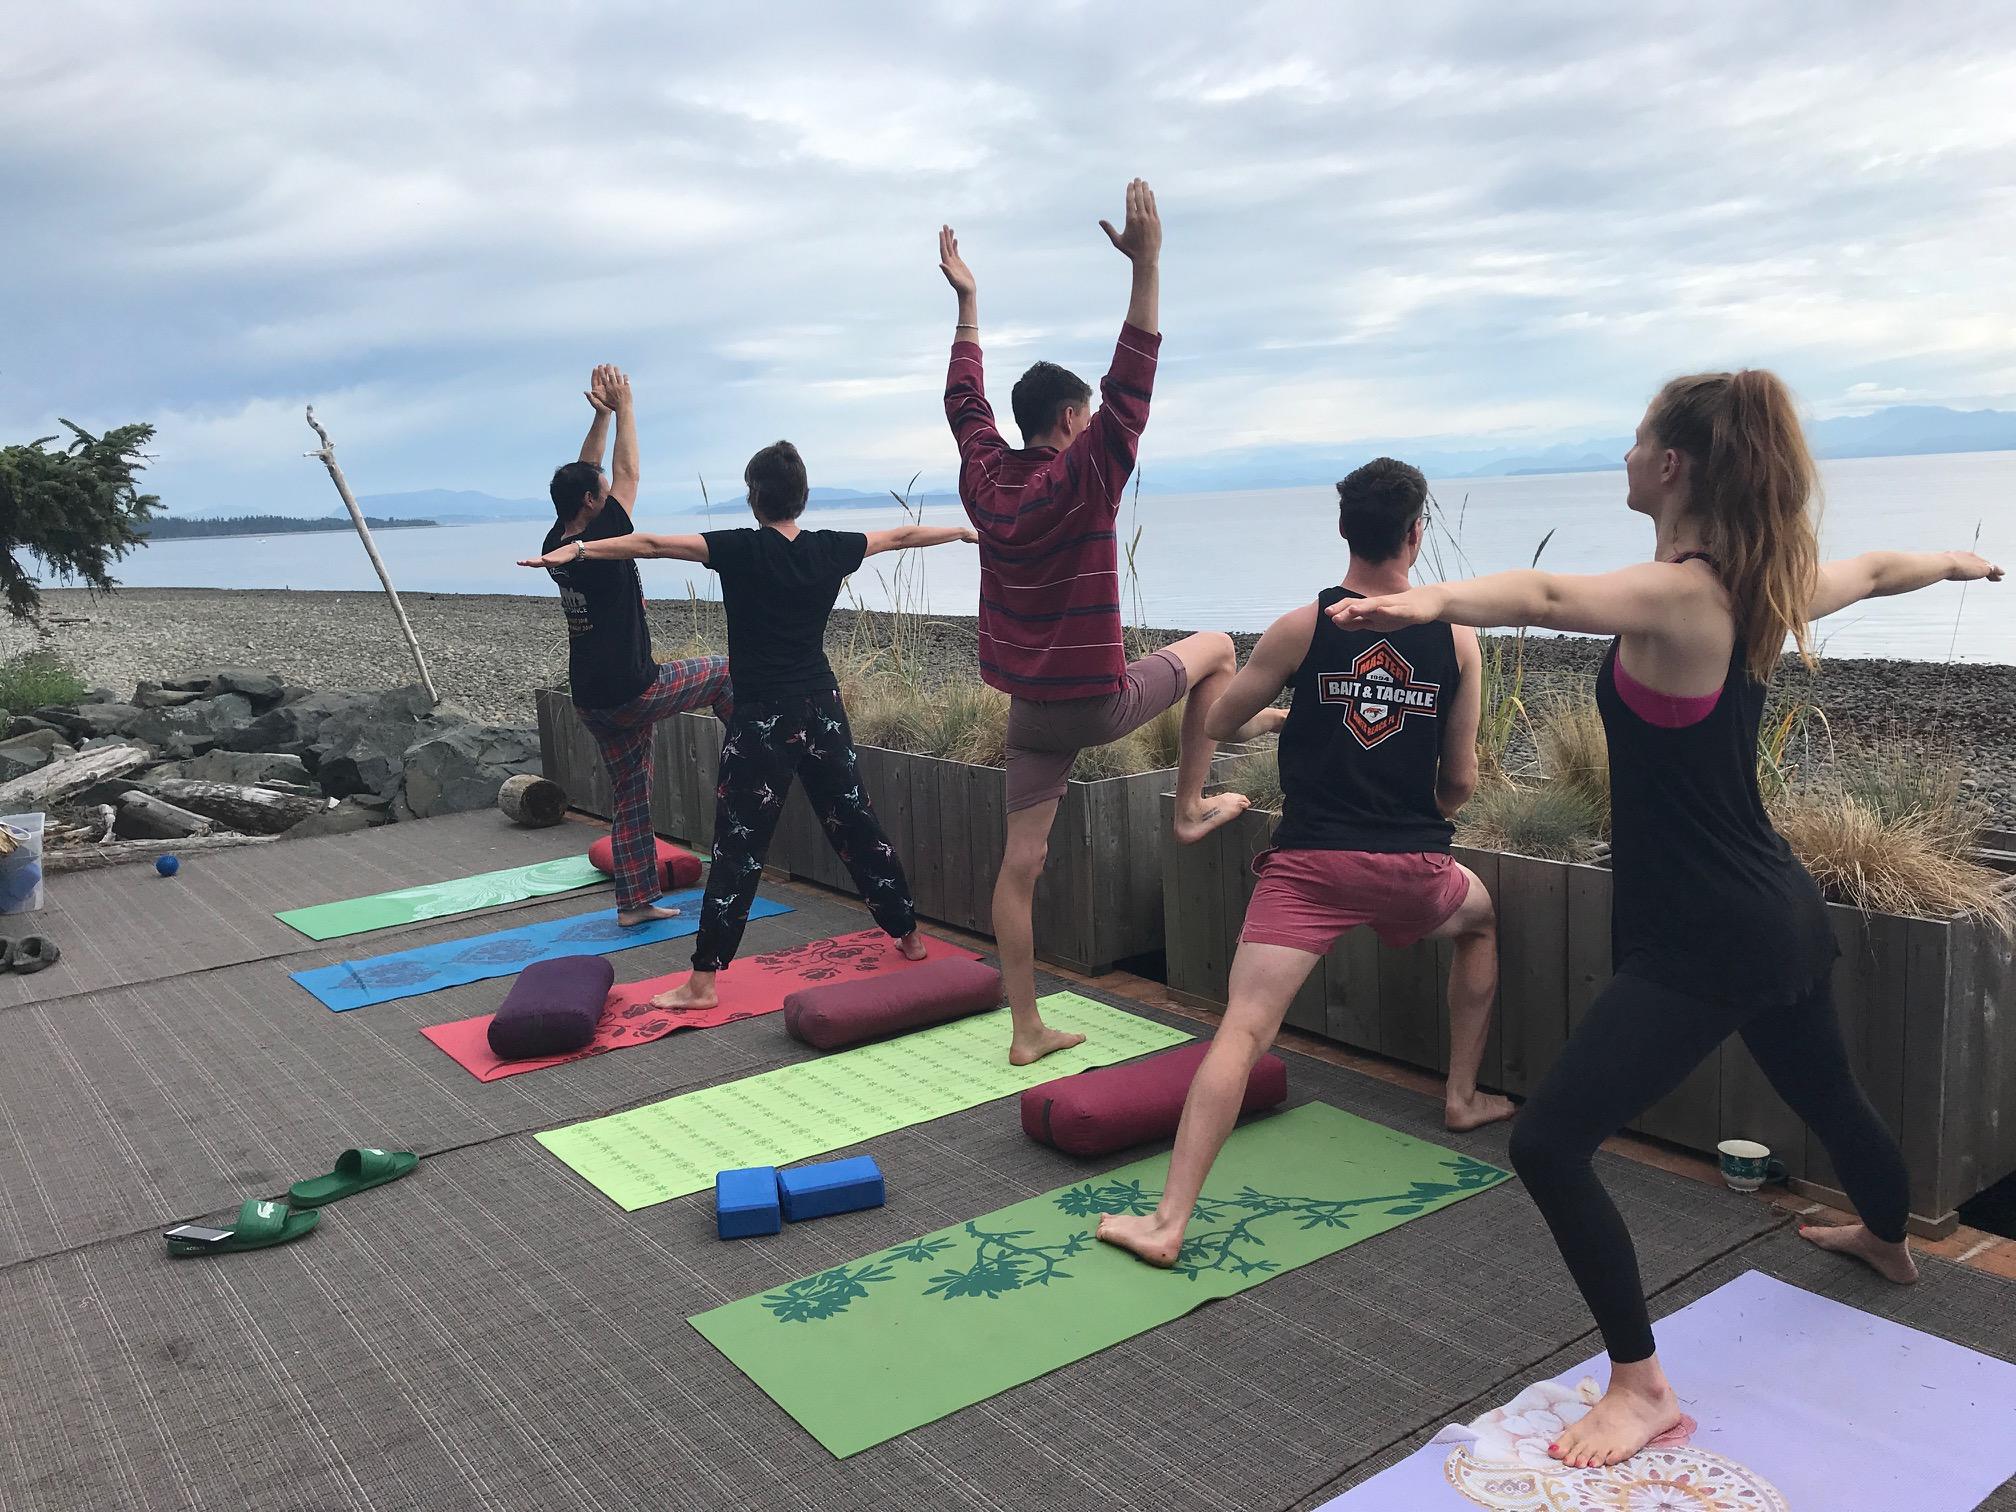 Seaview-Studio-Yoga-on-Dock.JPG